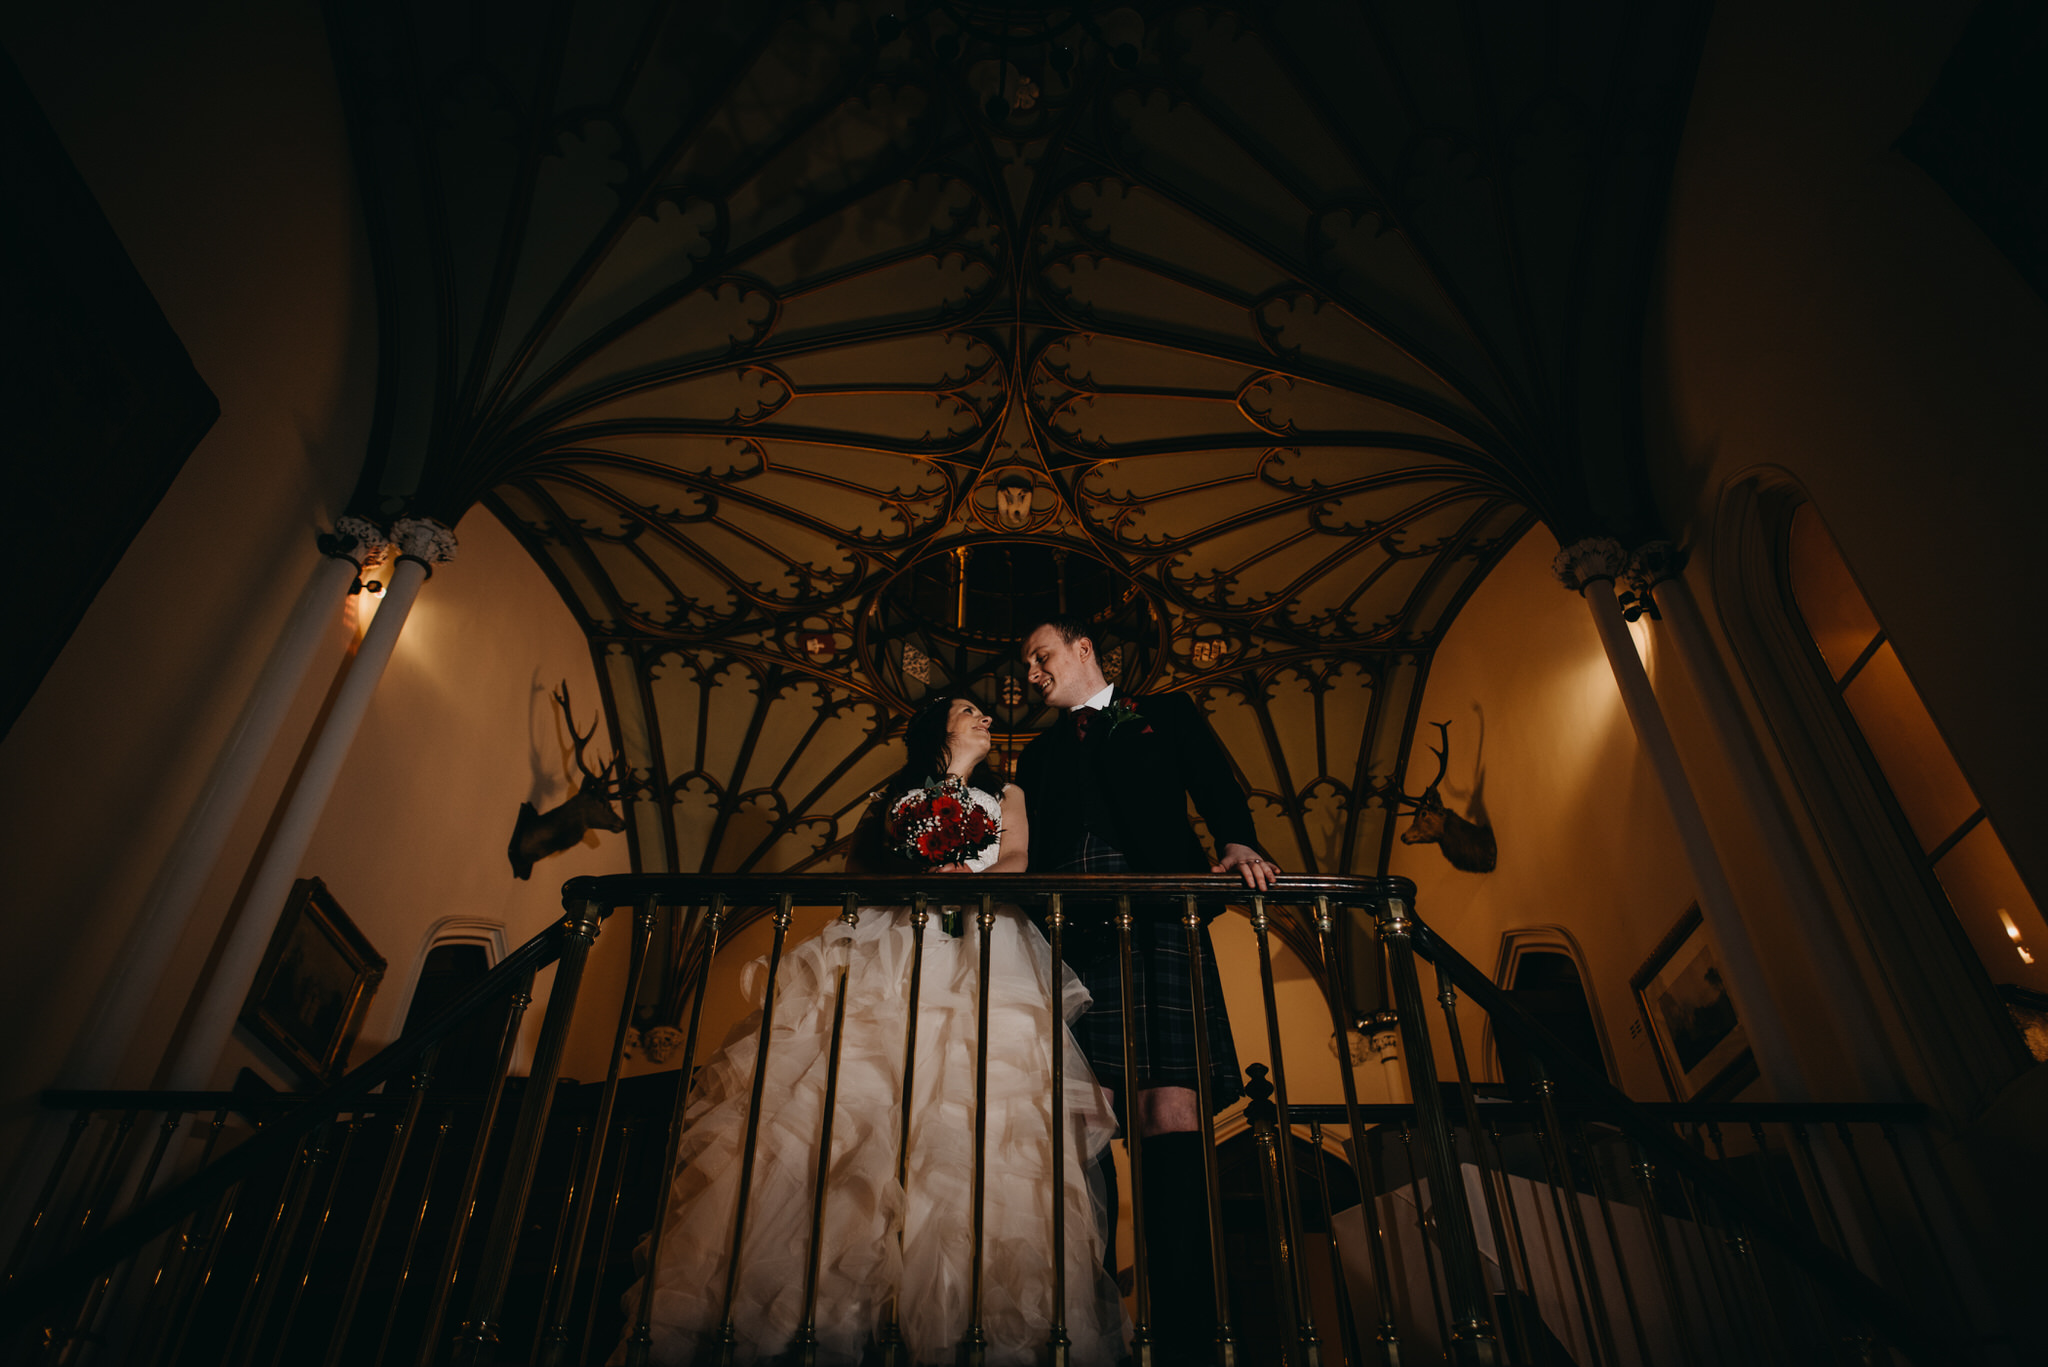 Emma & Grant Dalhousie-649.jpg